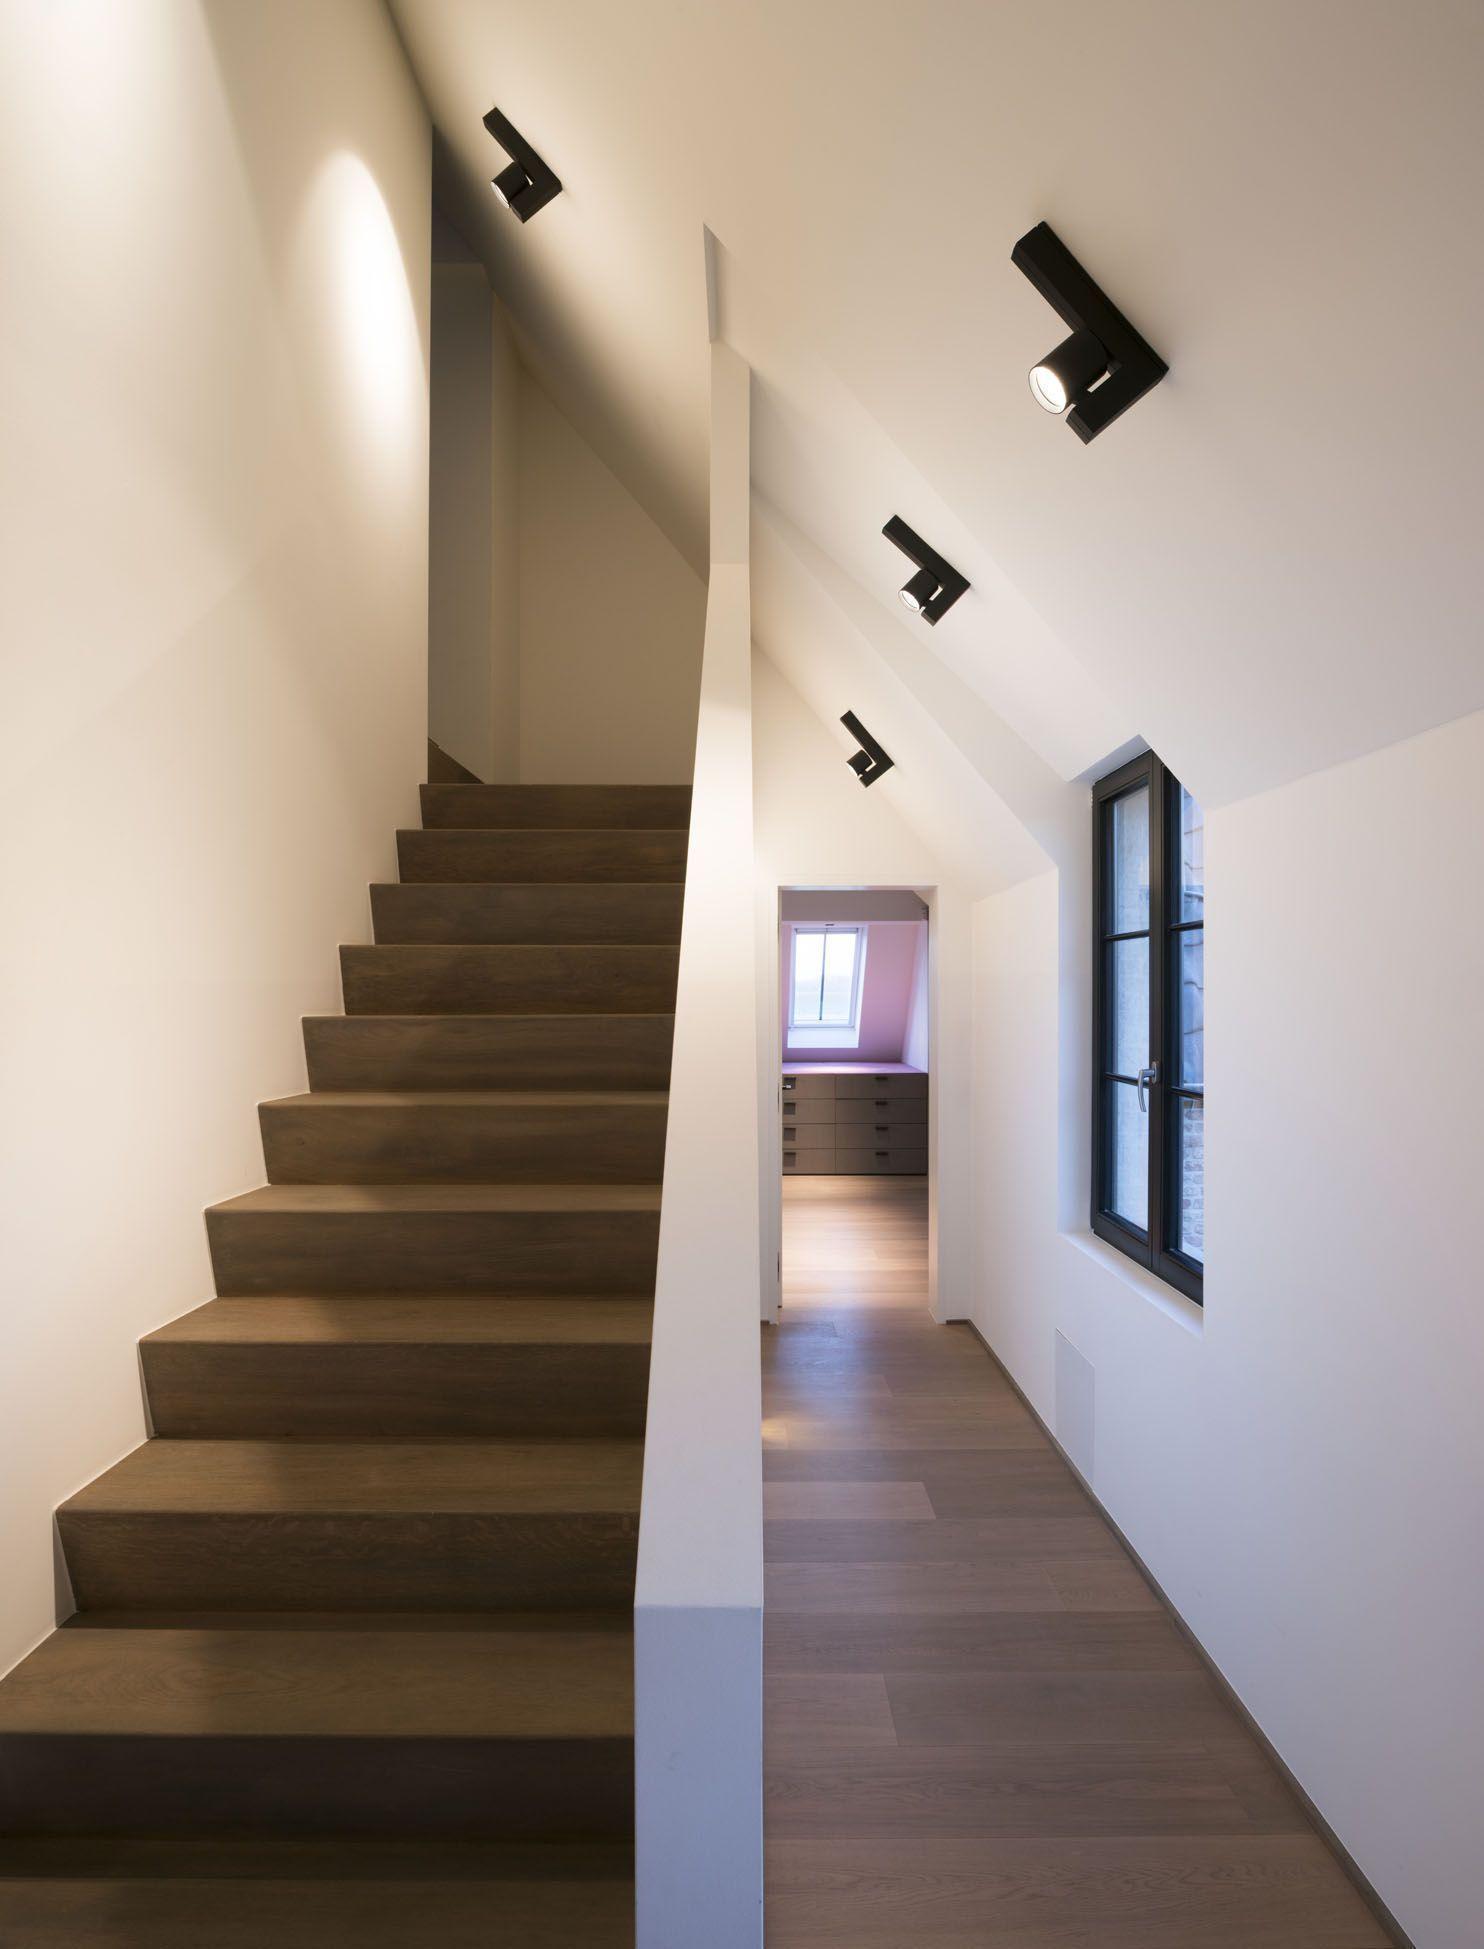 Hallway lighting modern  kreon lighting minimalist modern LED design architecture Erubo